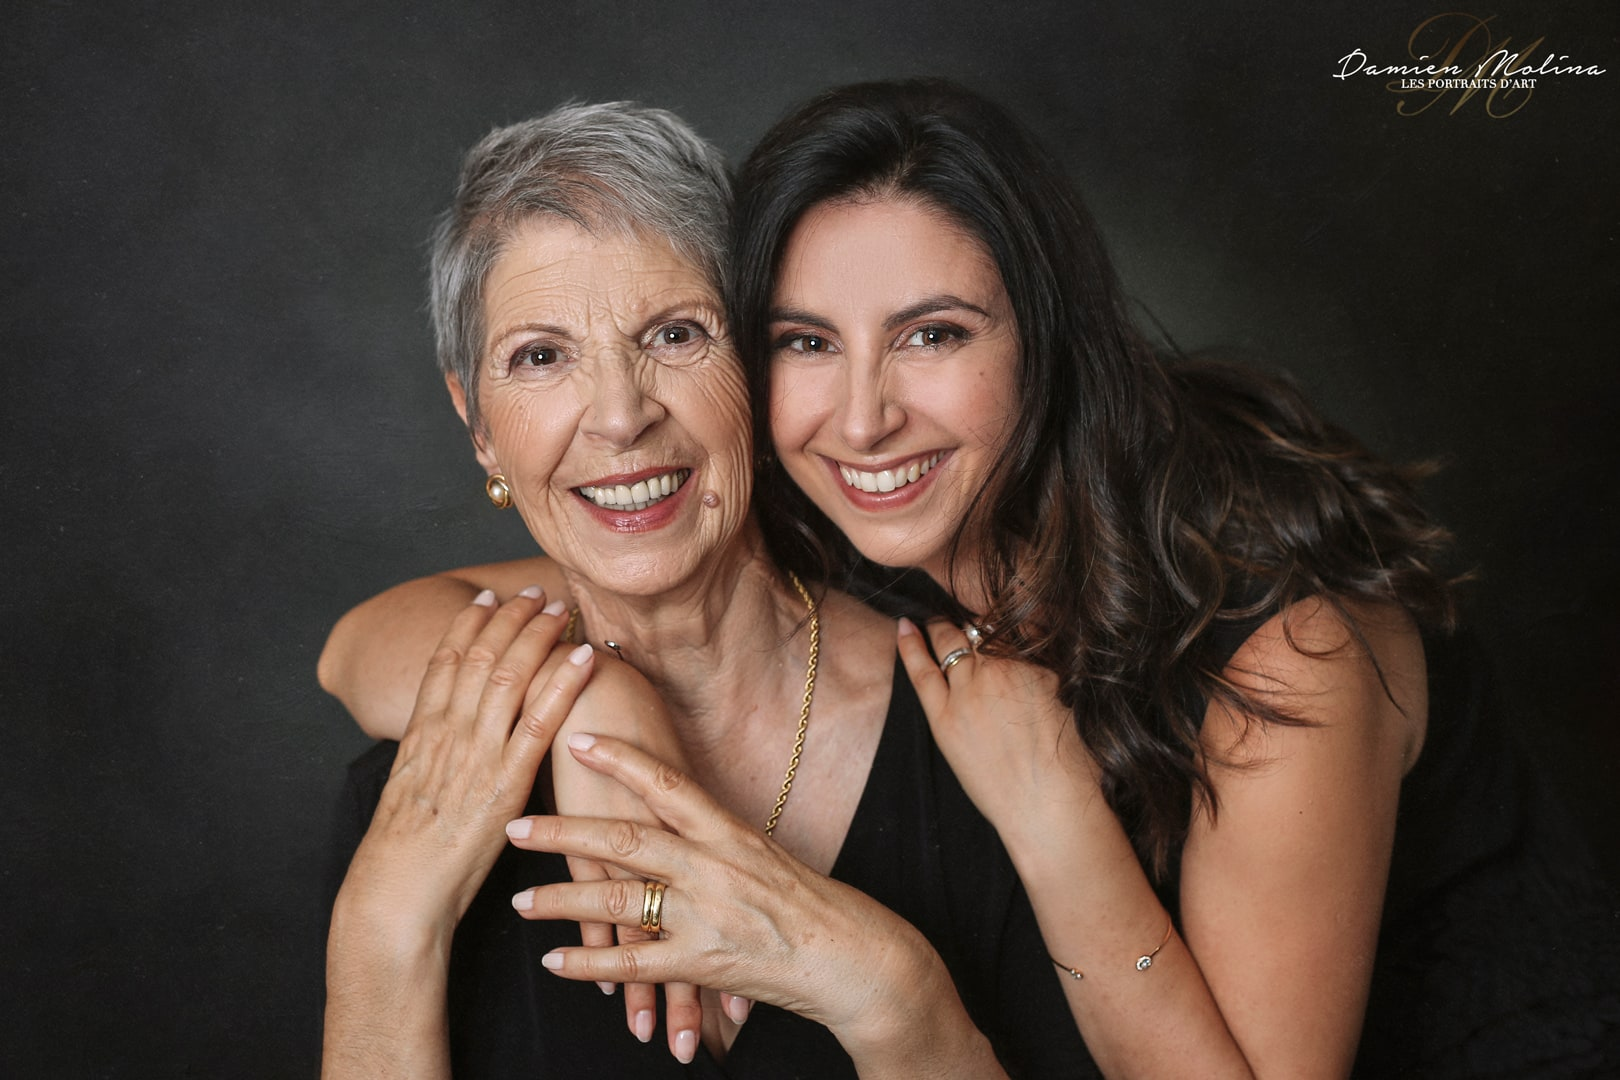 photographe strasbourg famille portrait